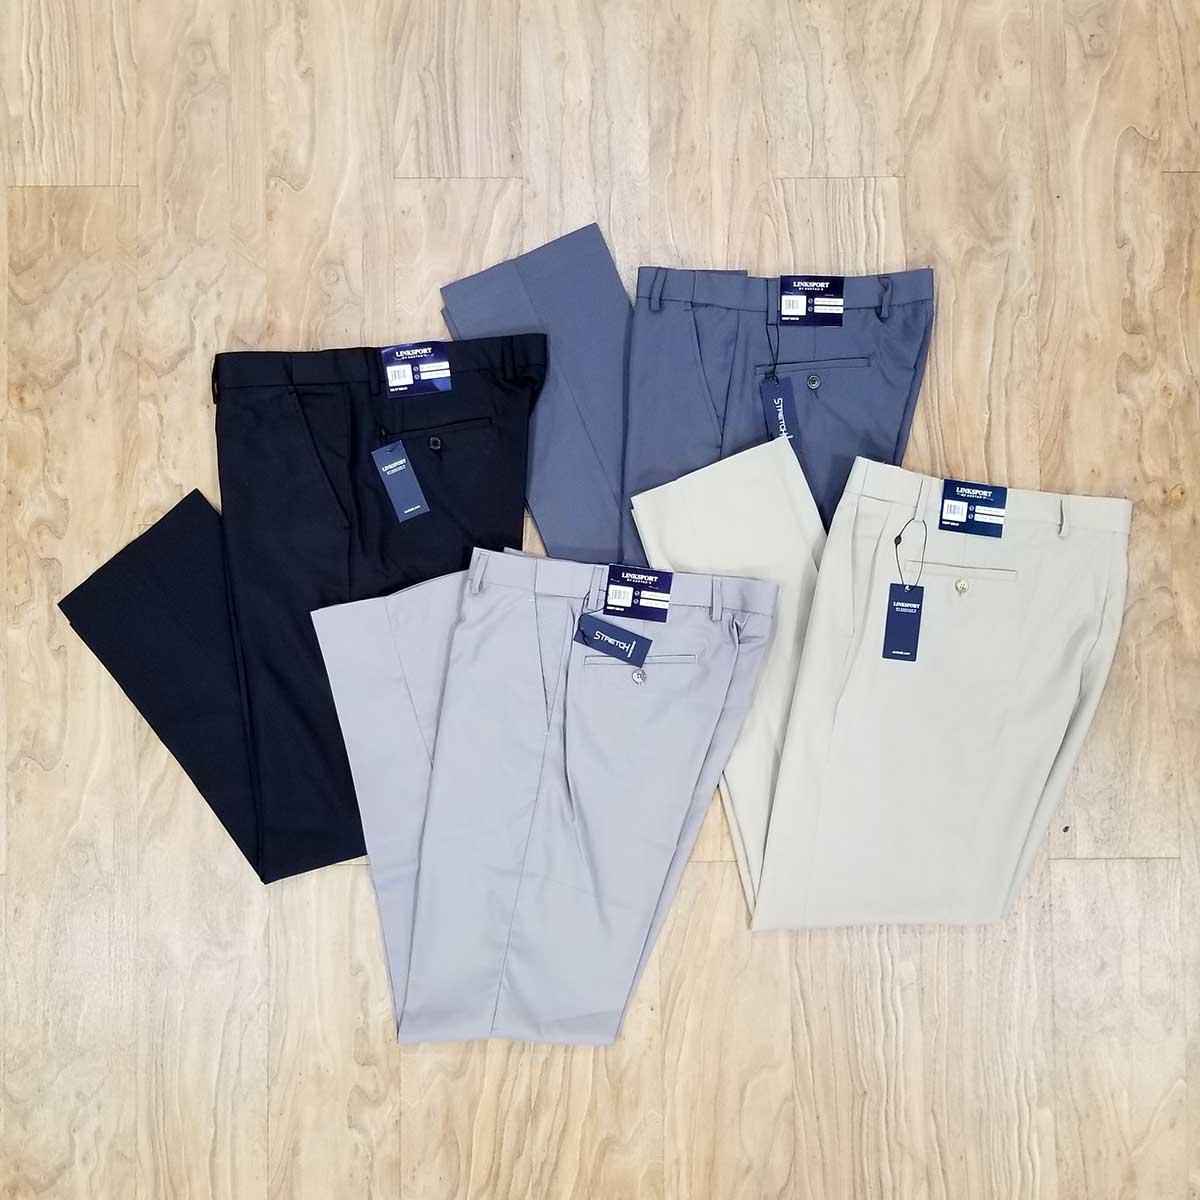 Linksport Premium Golf Pant - Light Grey